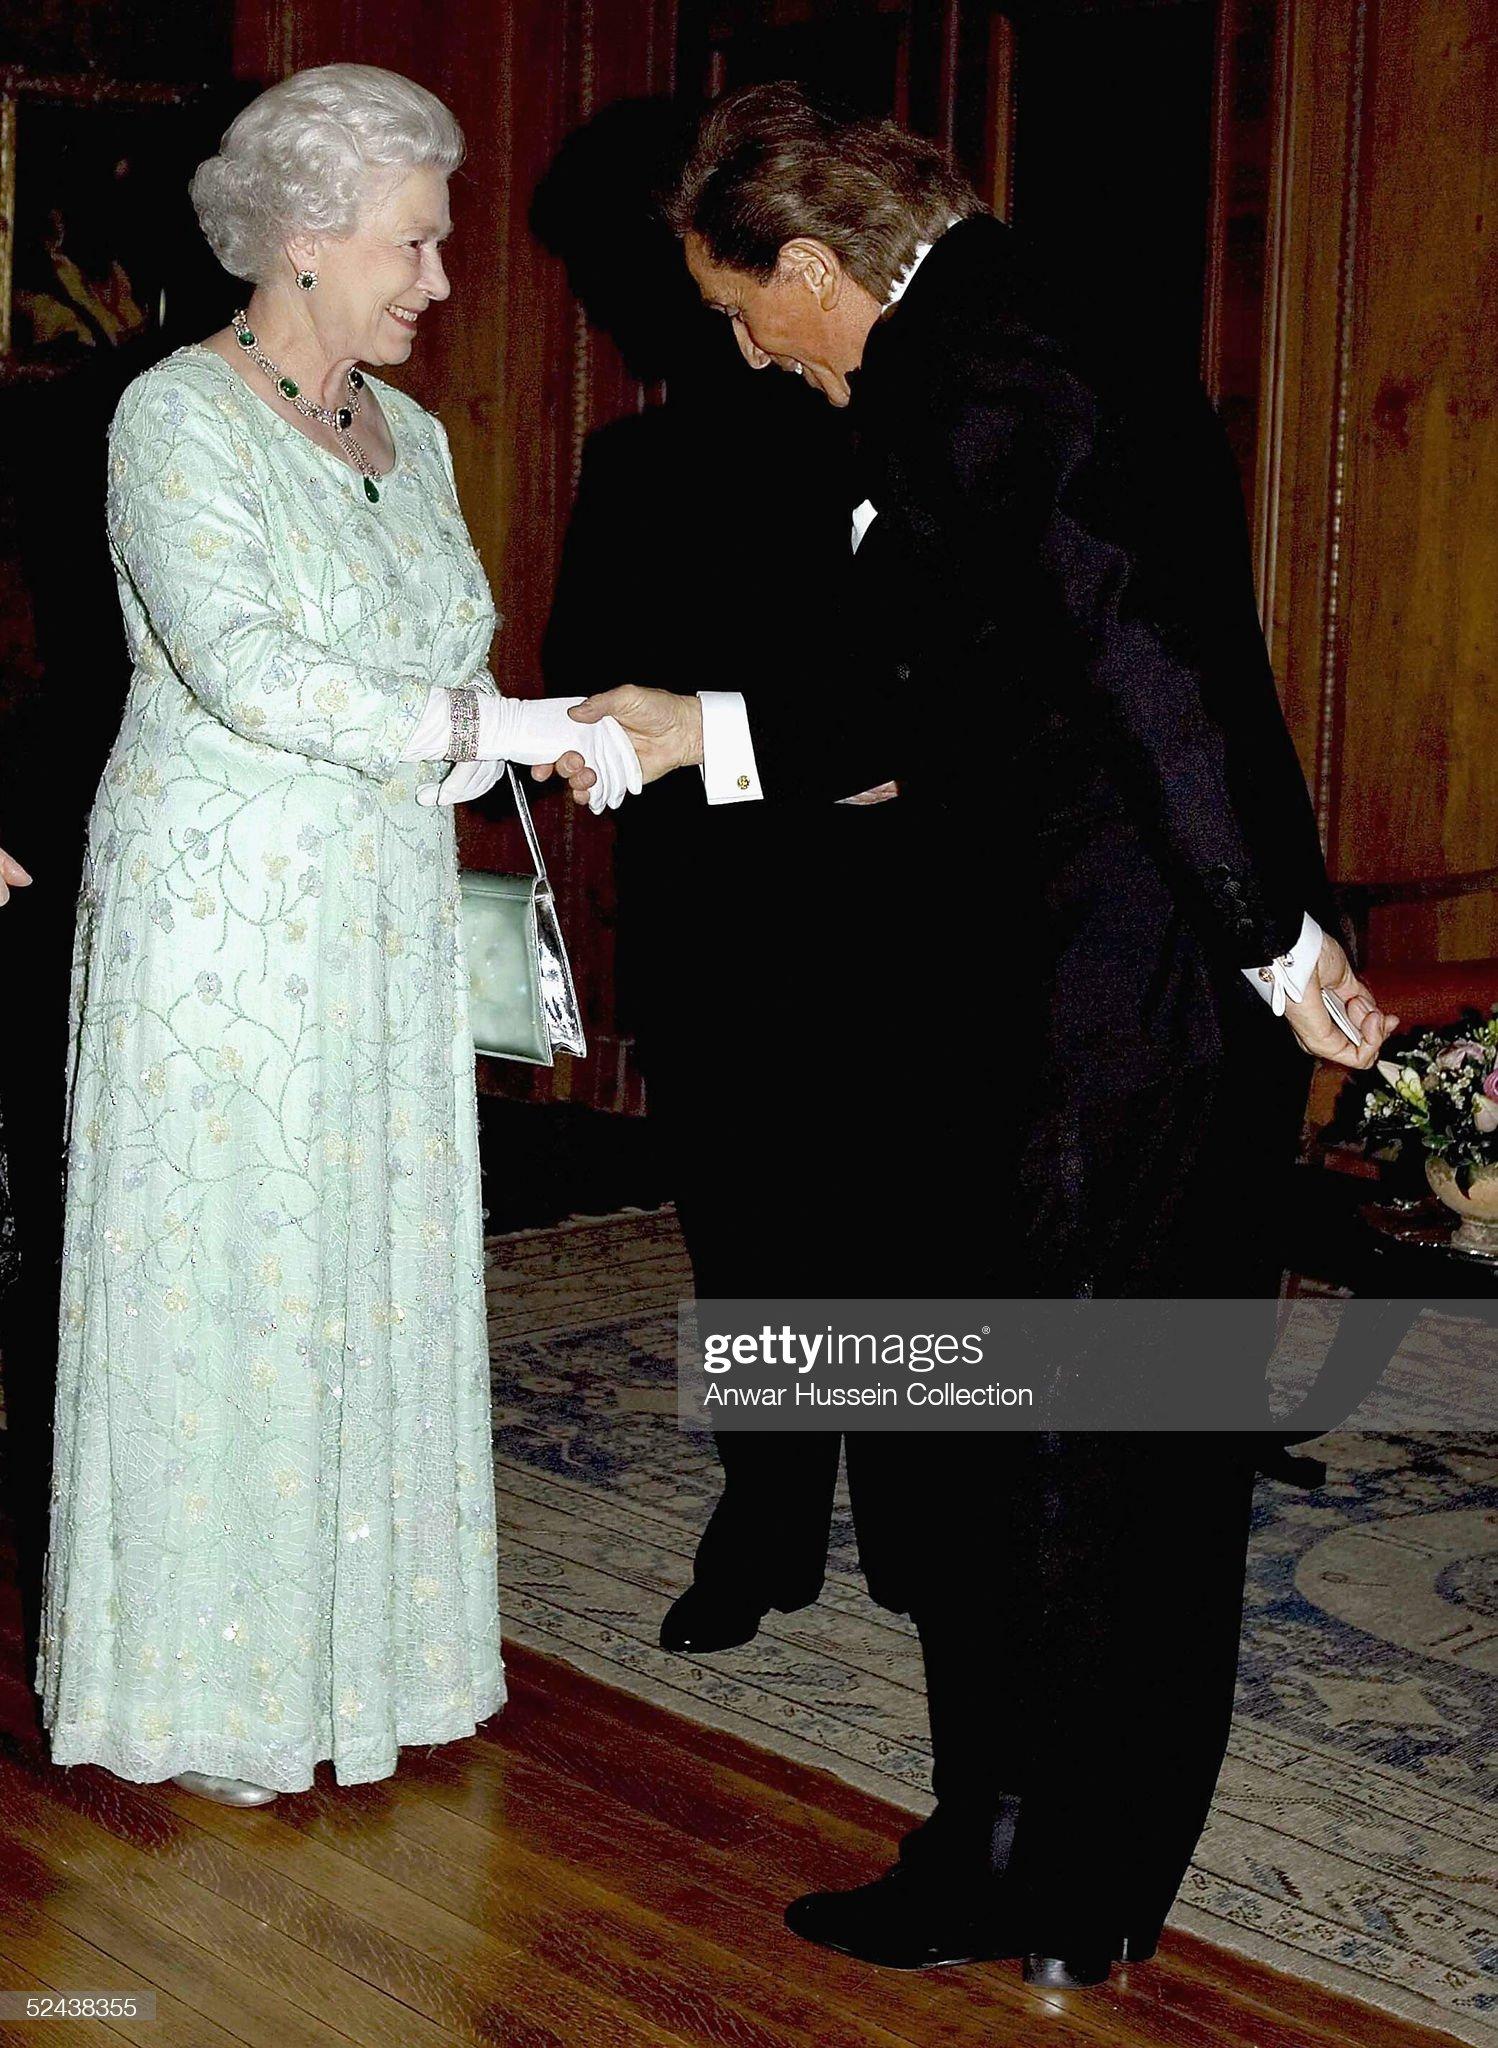 Banquet Honouring The Italian Republic Presidents Visit : News Photo